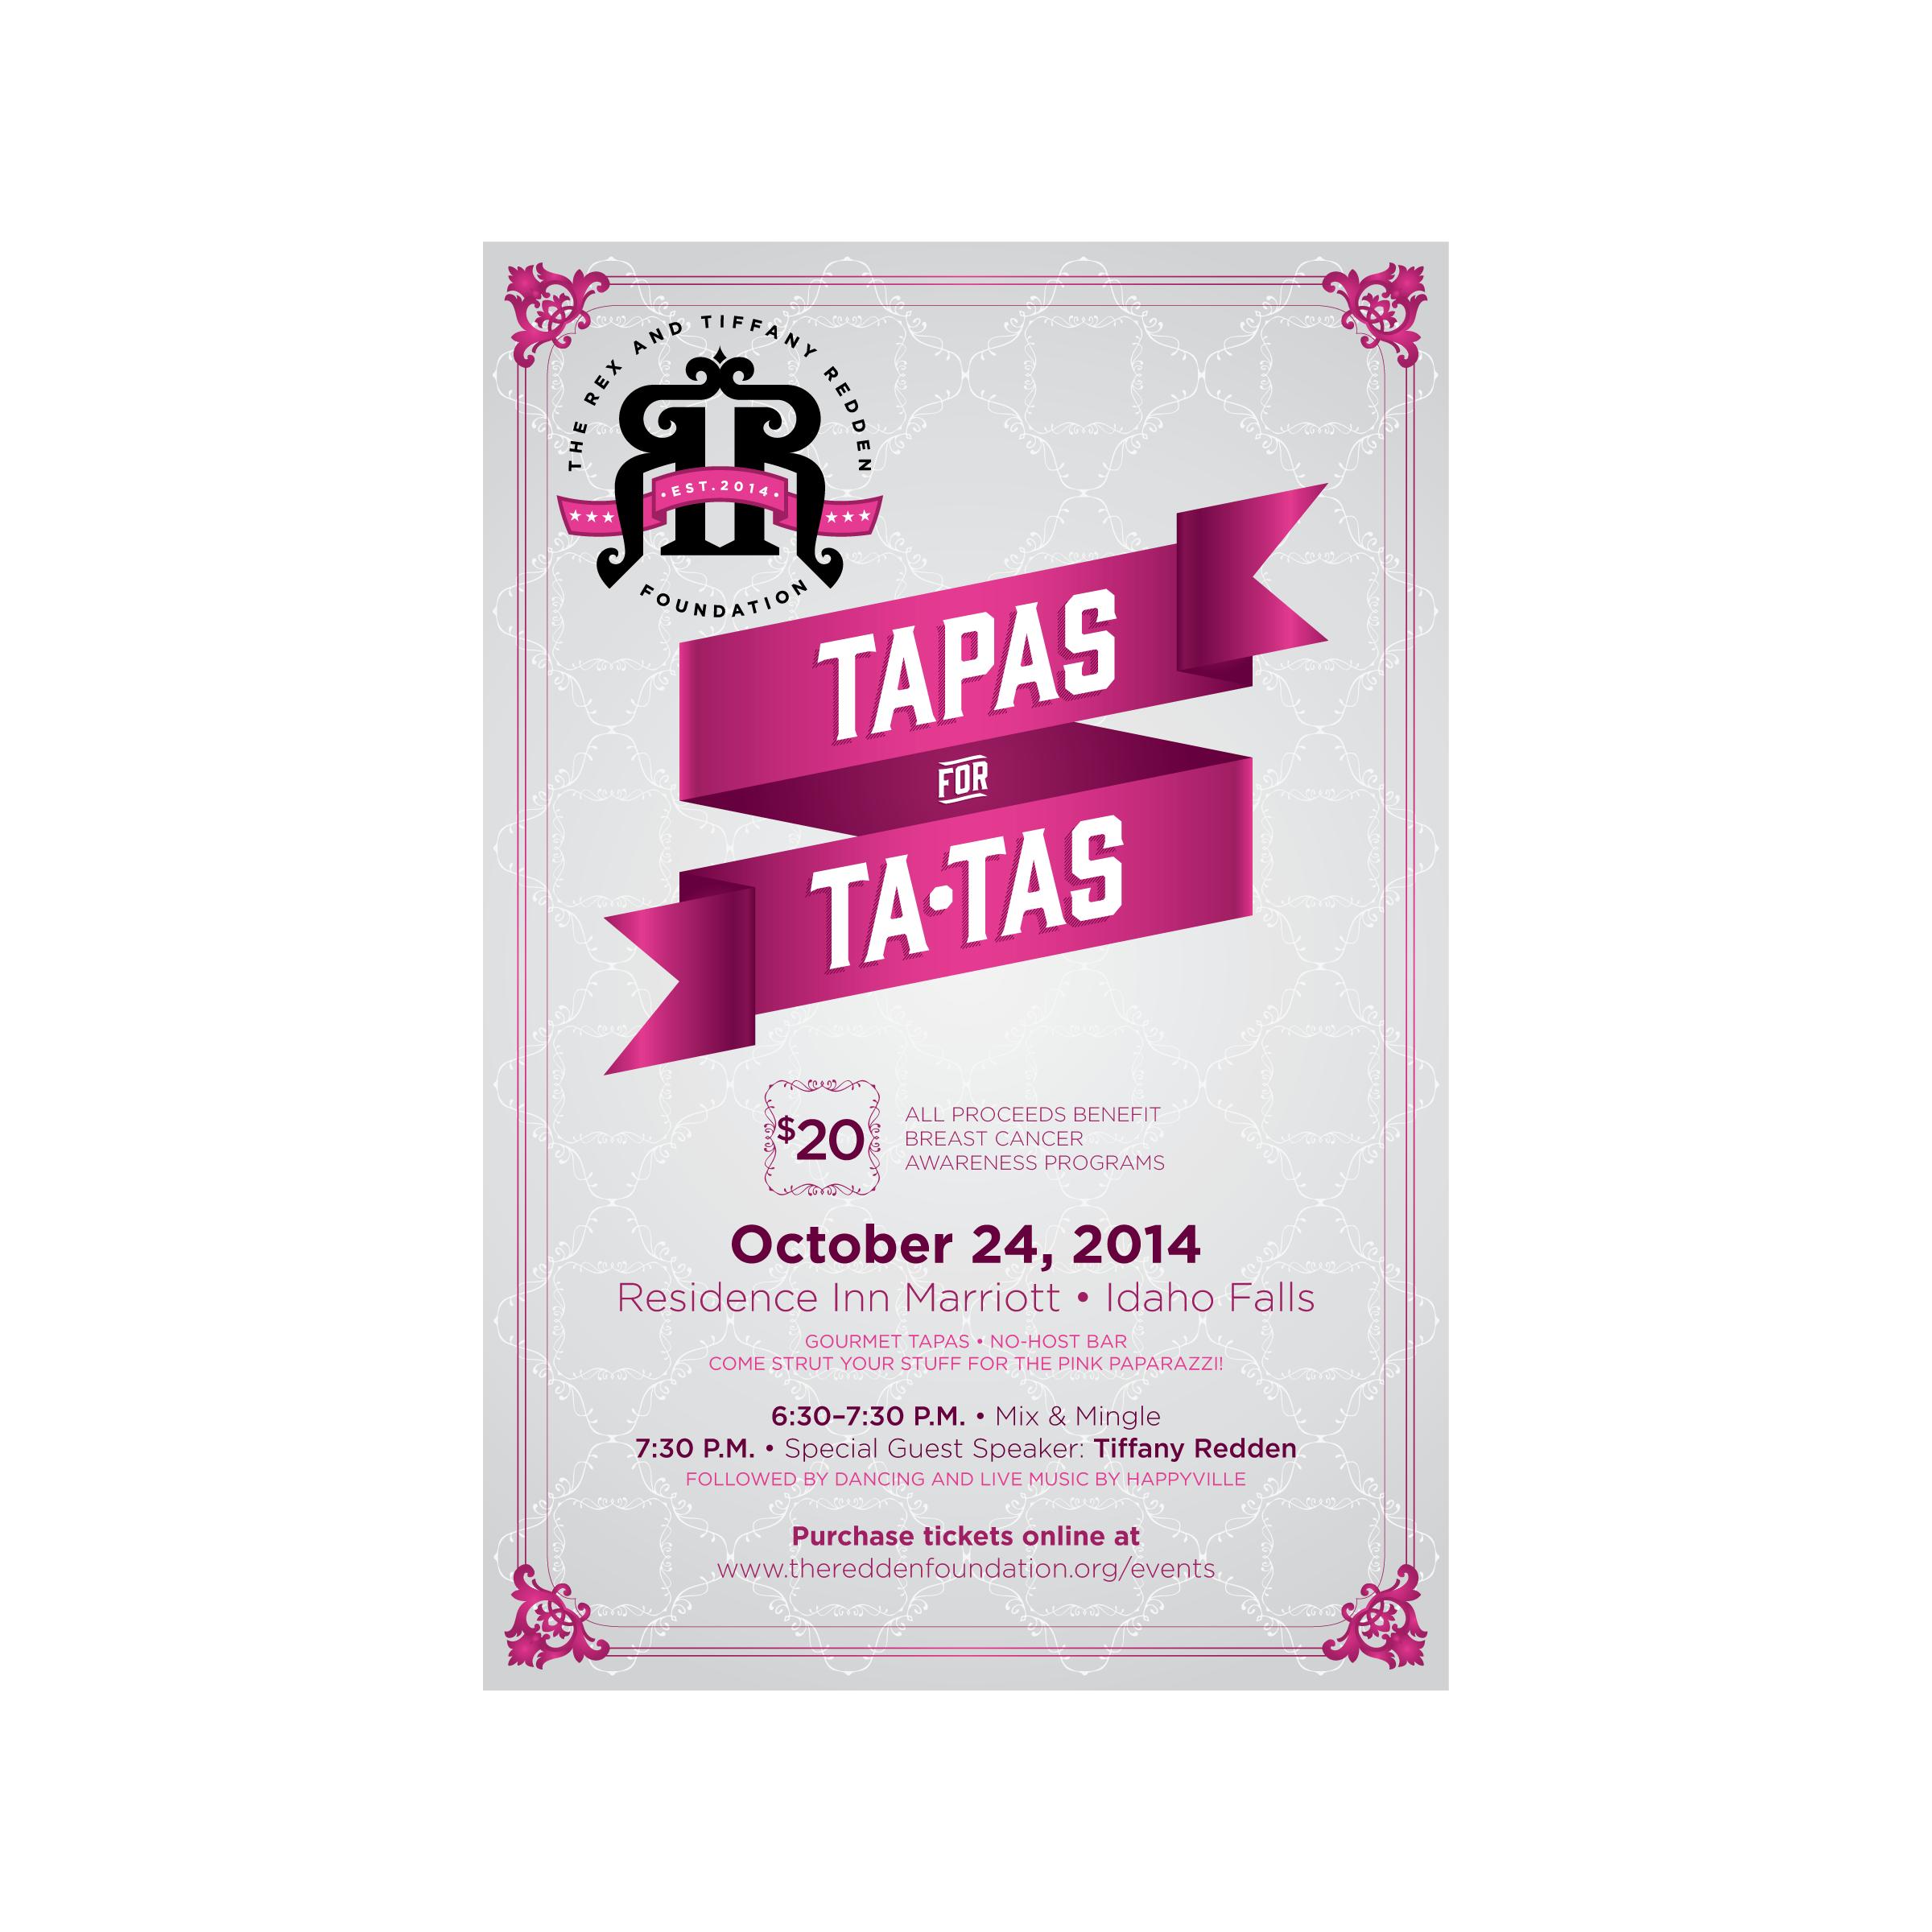 RTRF_TapasInvite.png